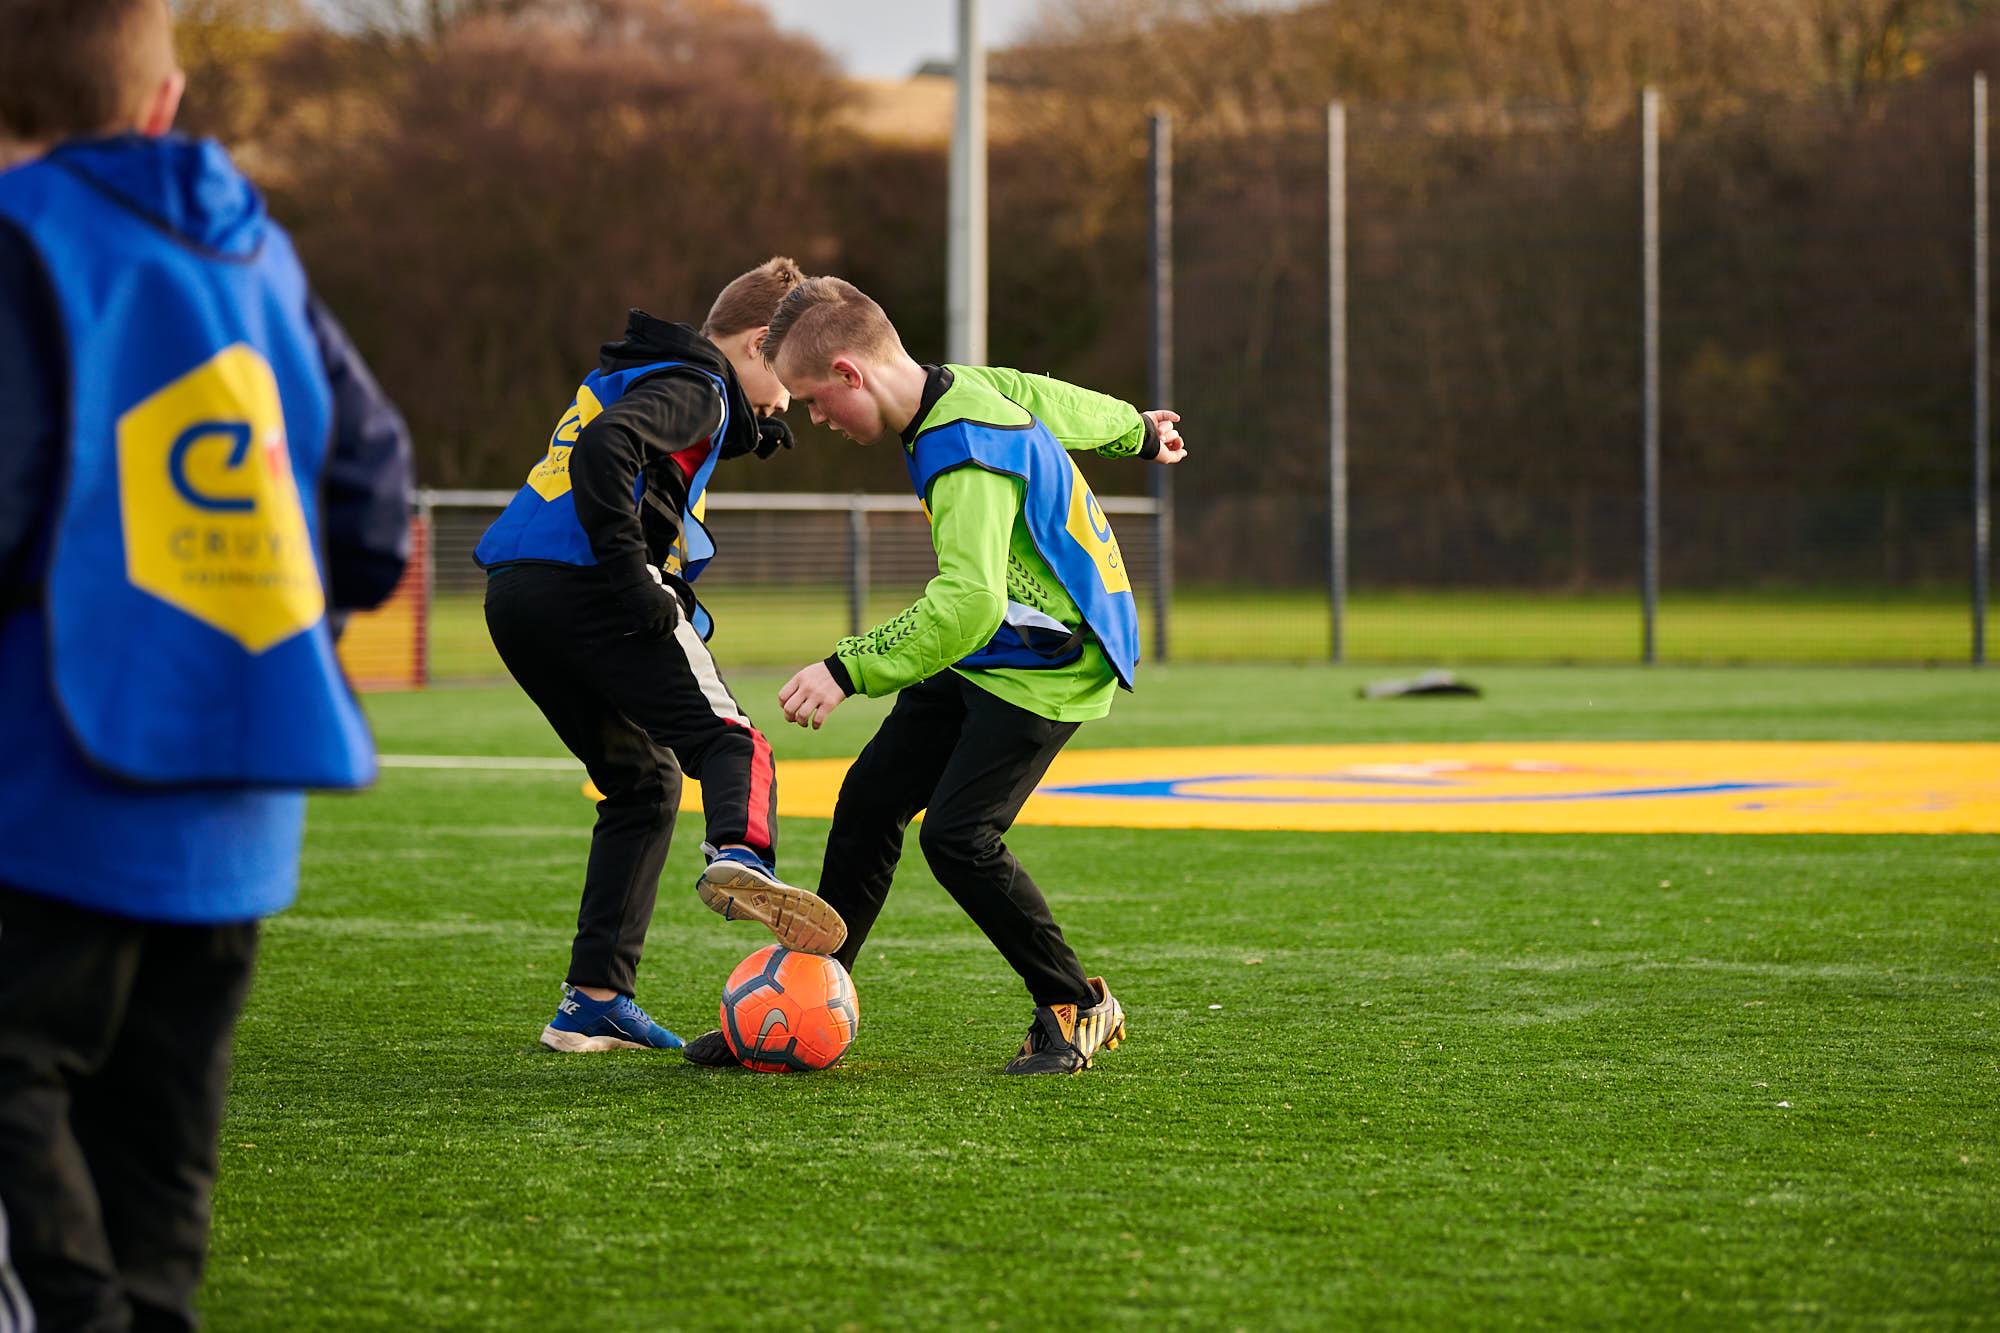 Kids playing football on a Cruyff Court